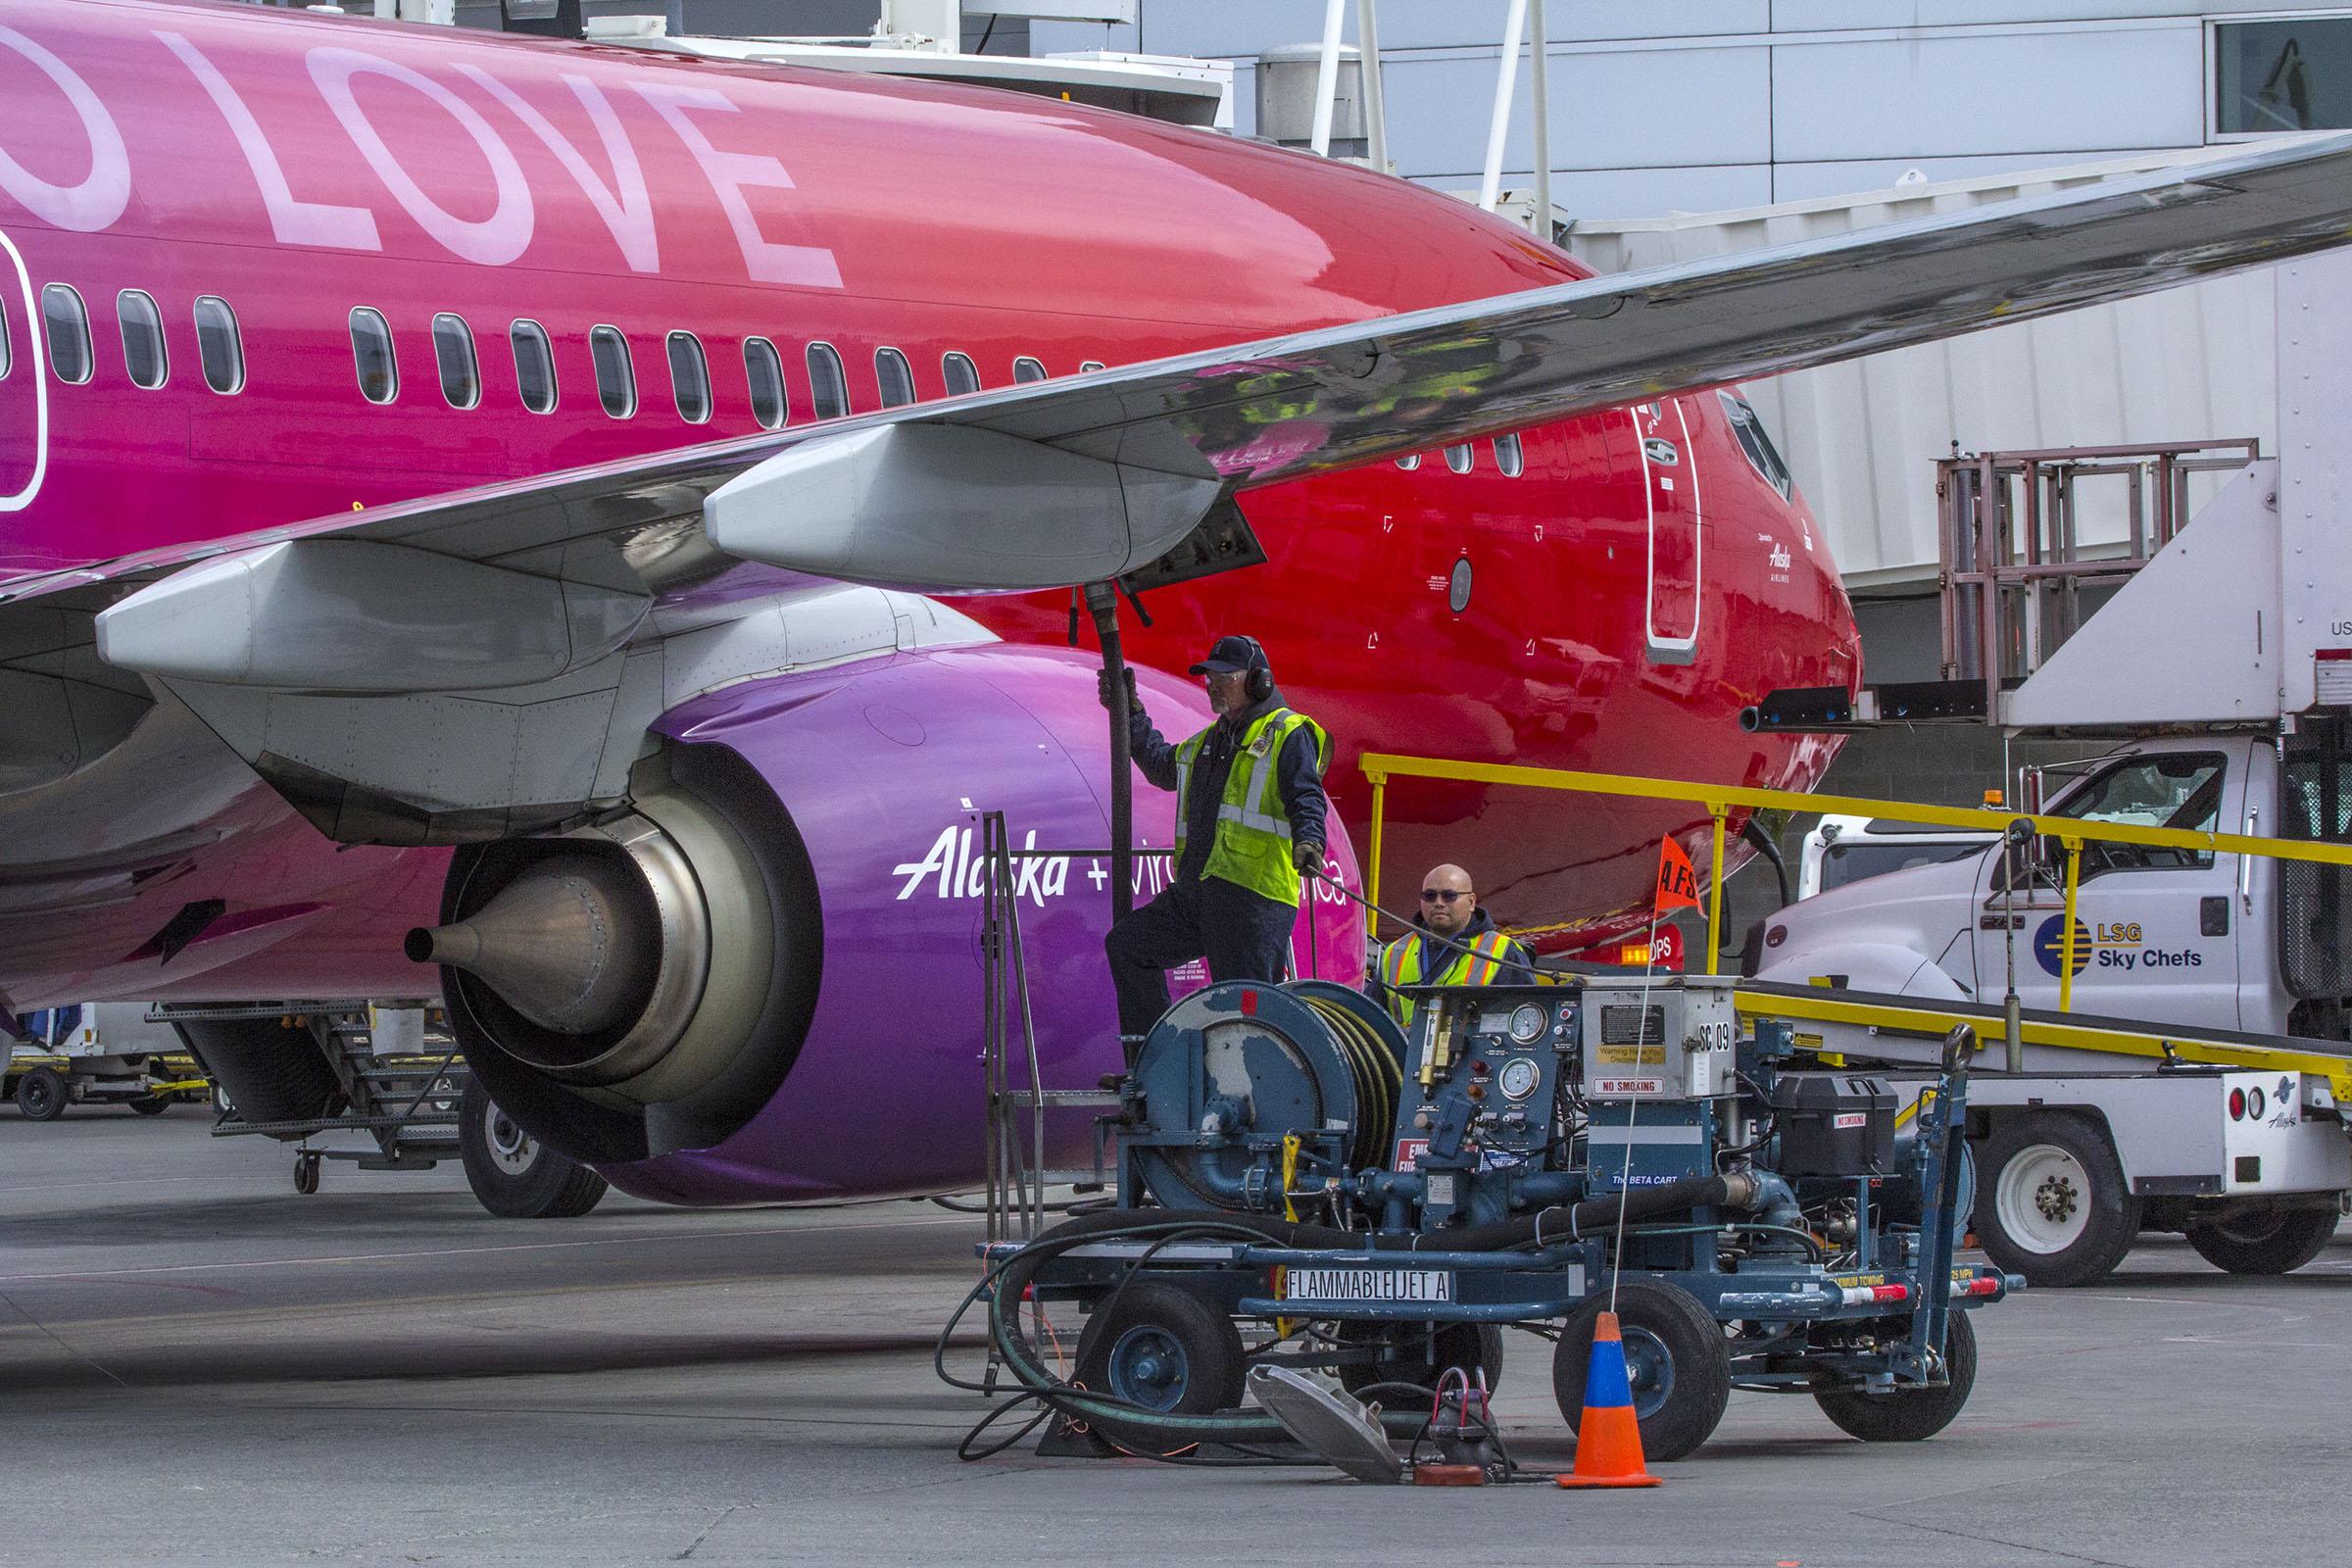 Alaska jet, aircraft, fueling, ANC, Alaskafoto images